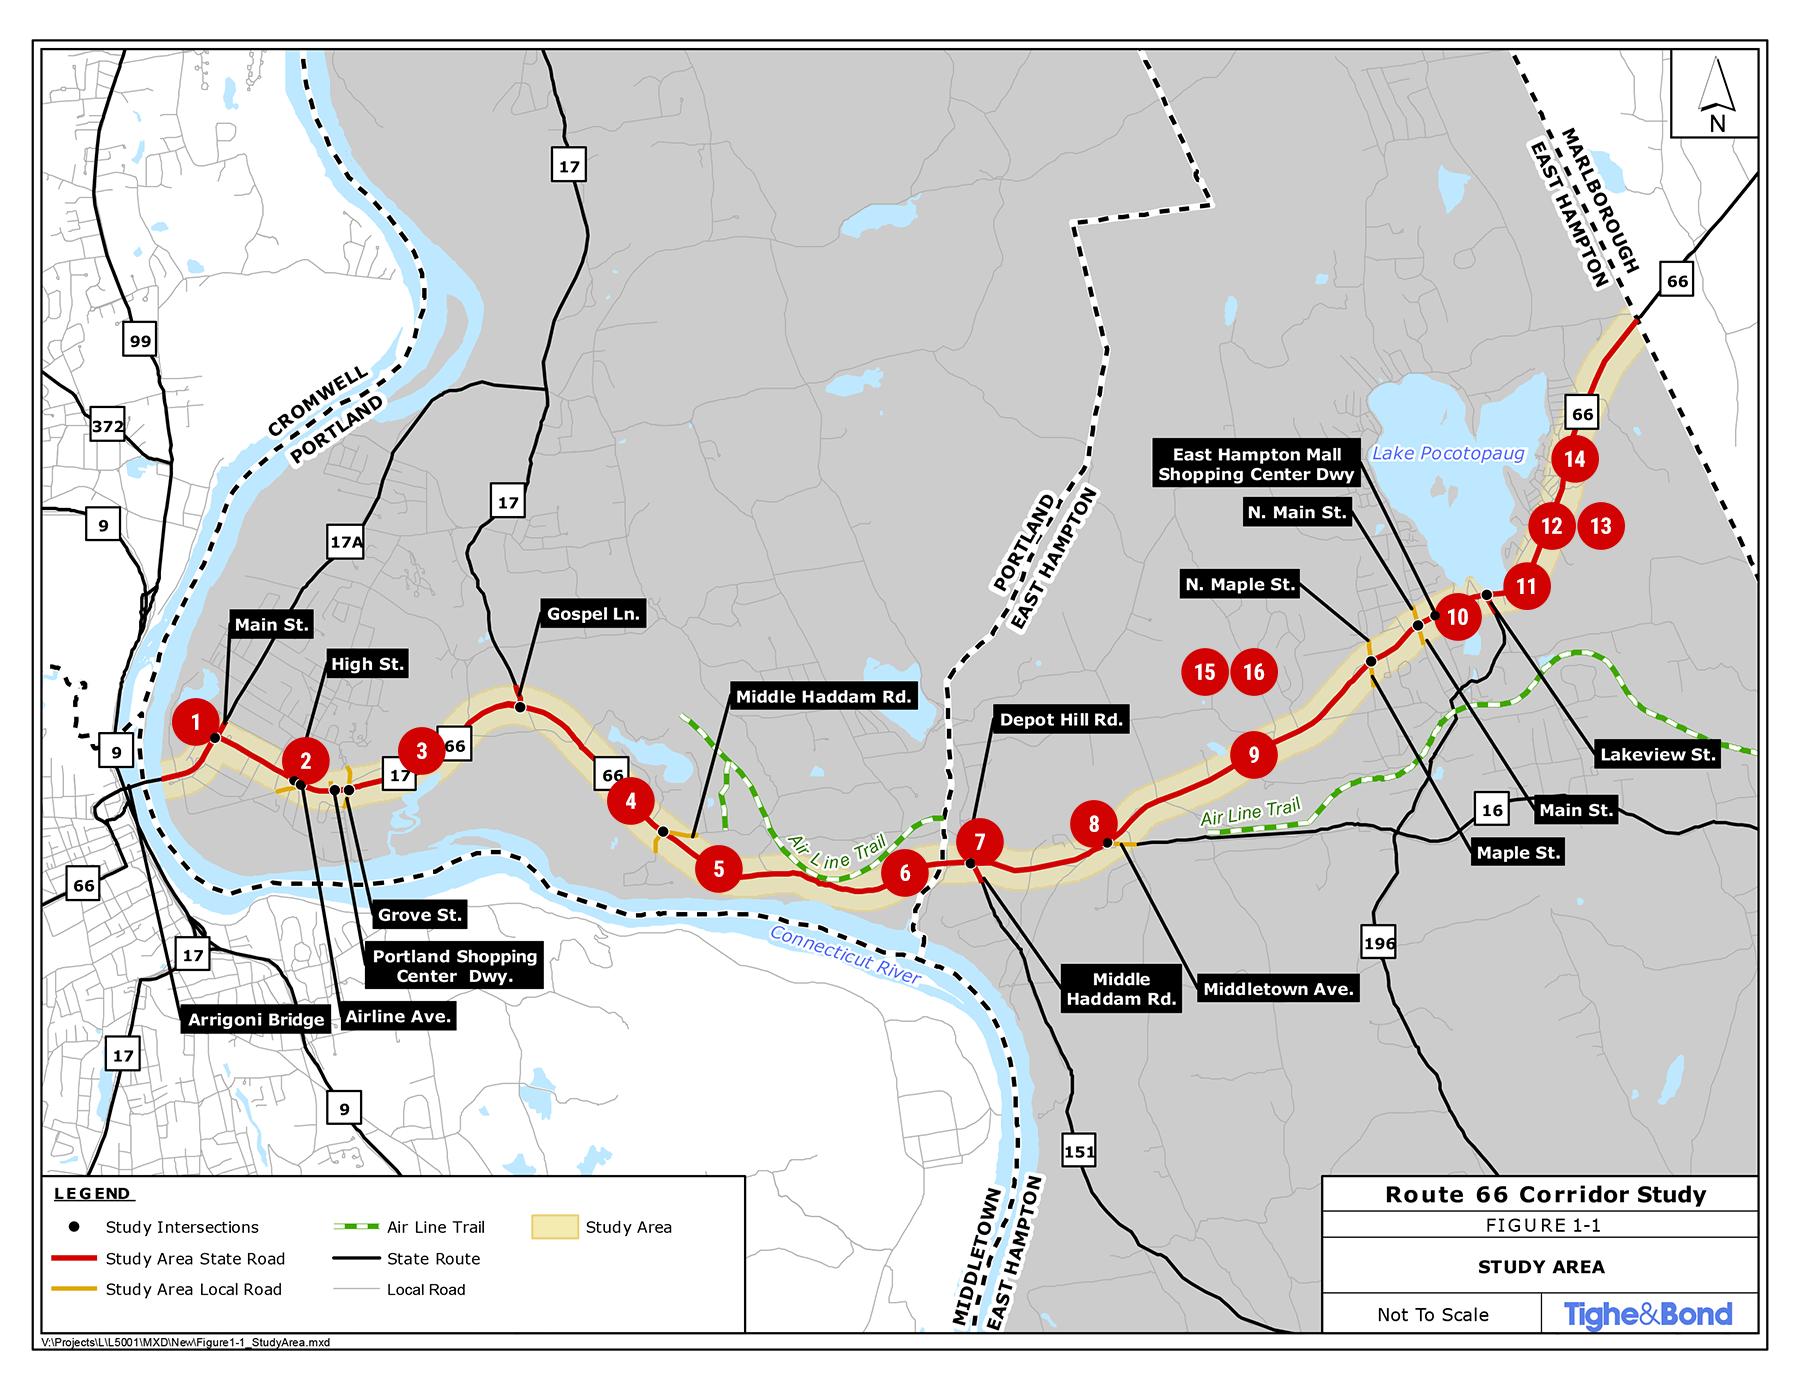 Route 66 Transportation Study, Portland and East Hampton, CT.